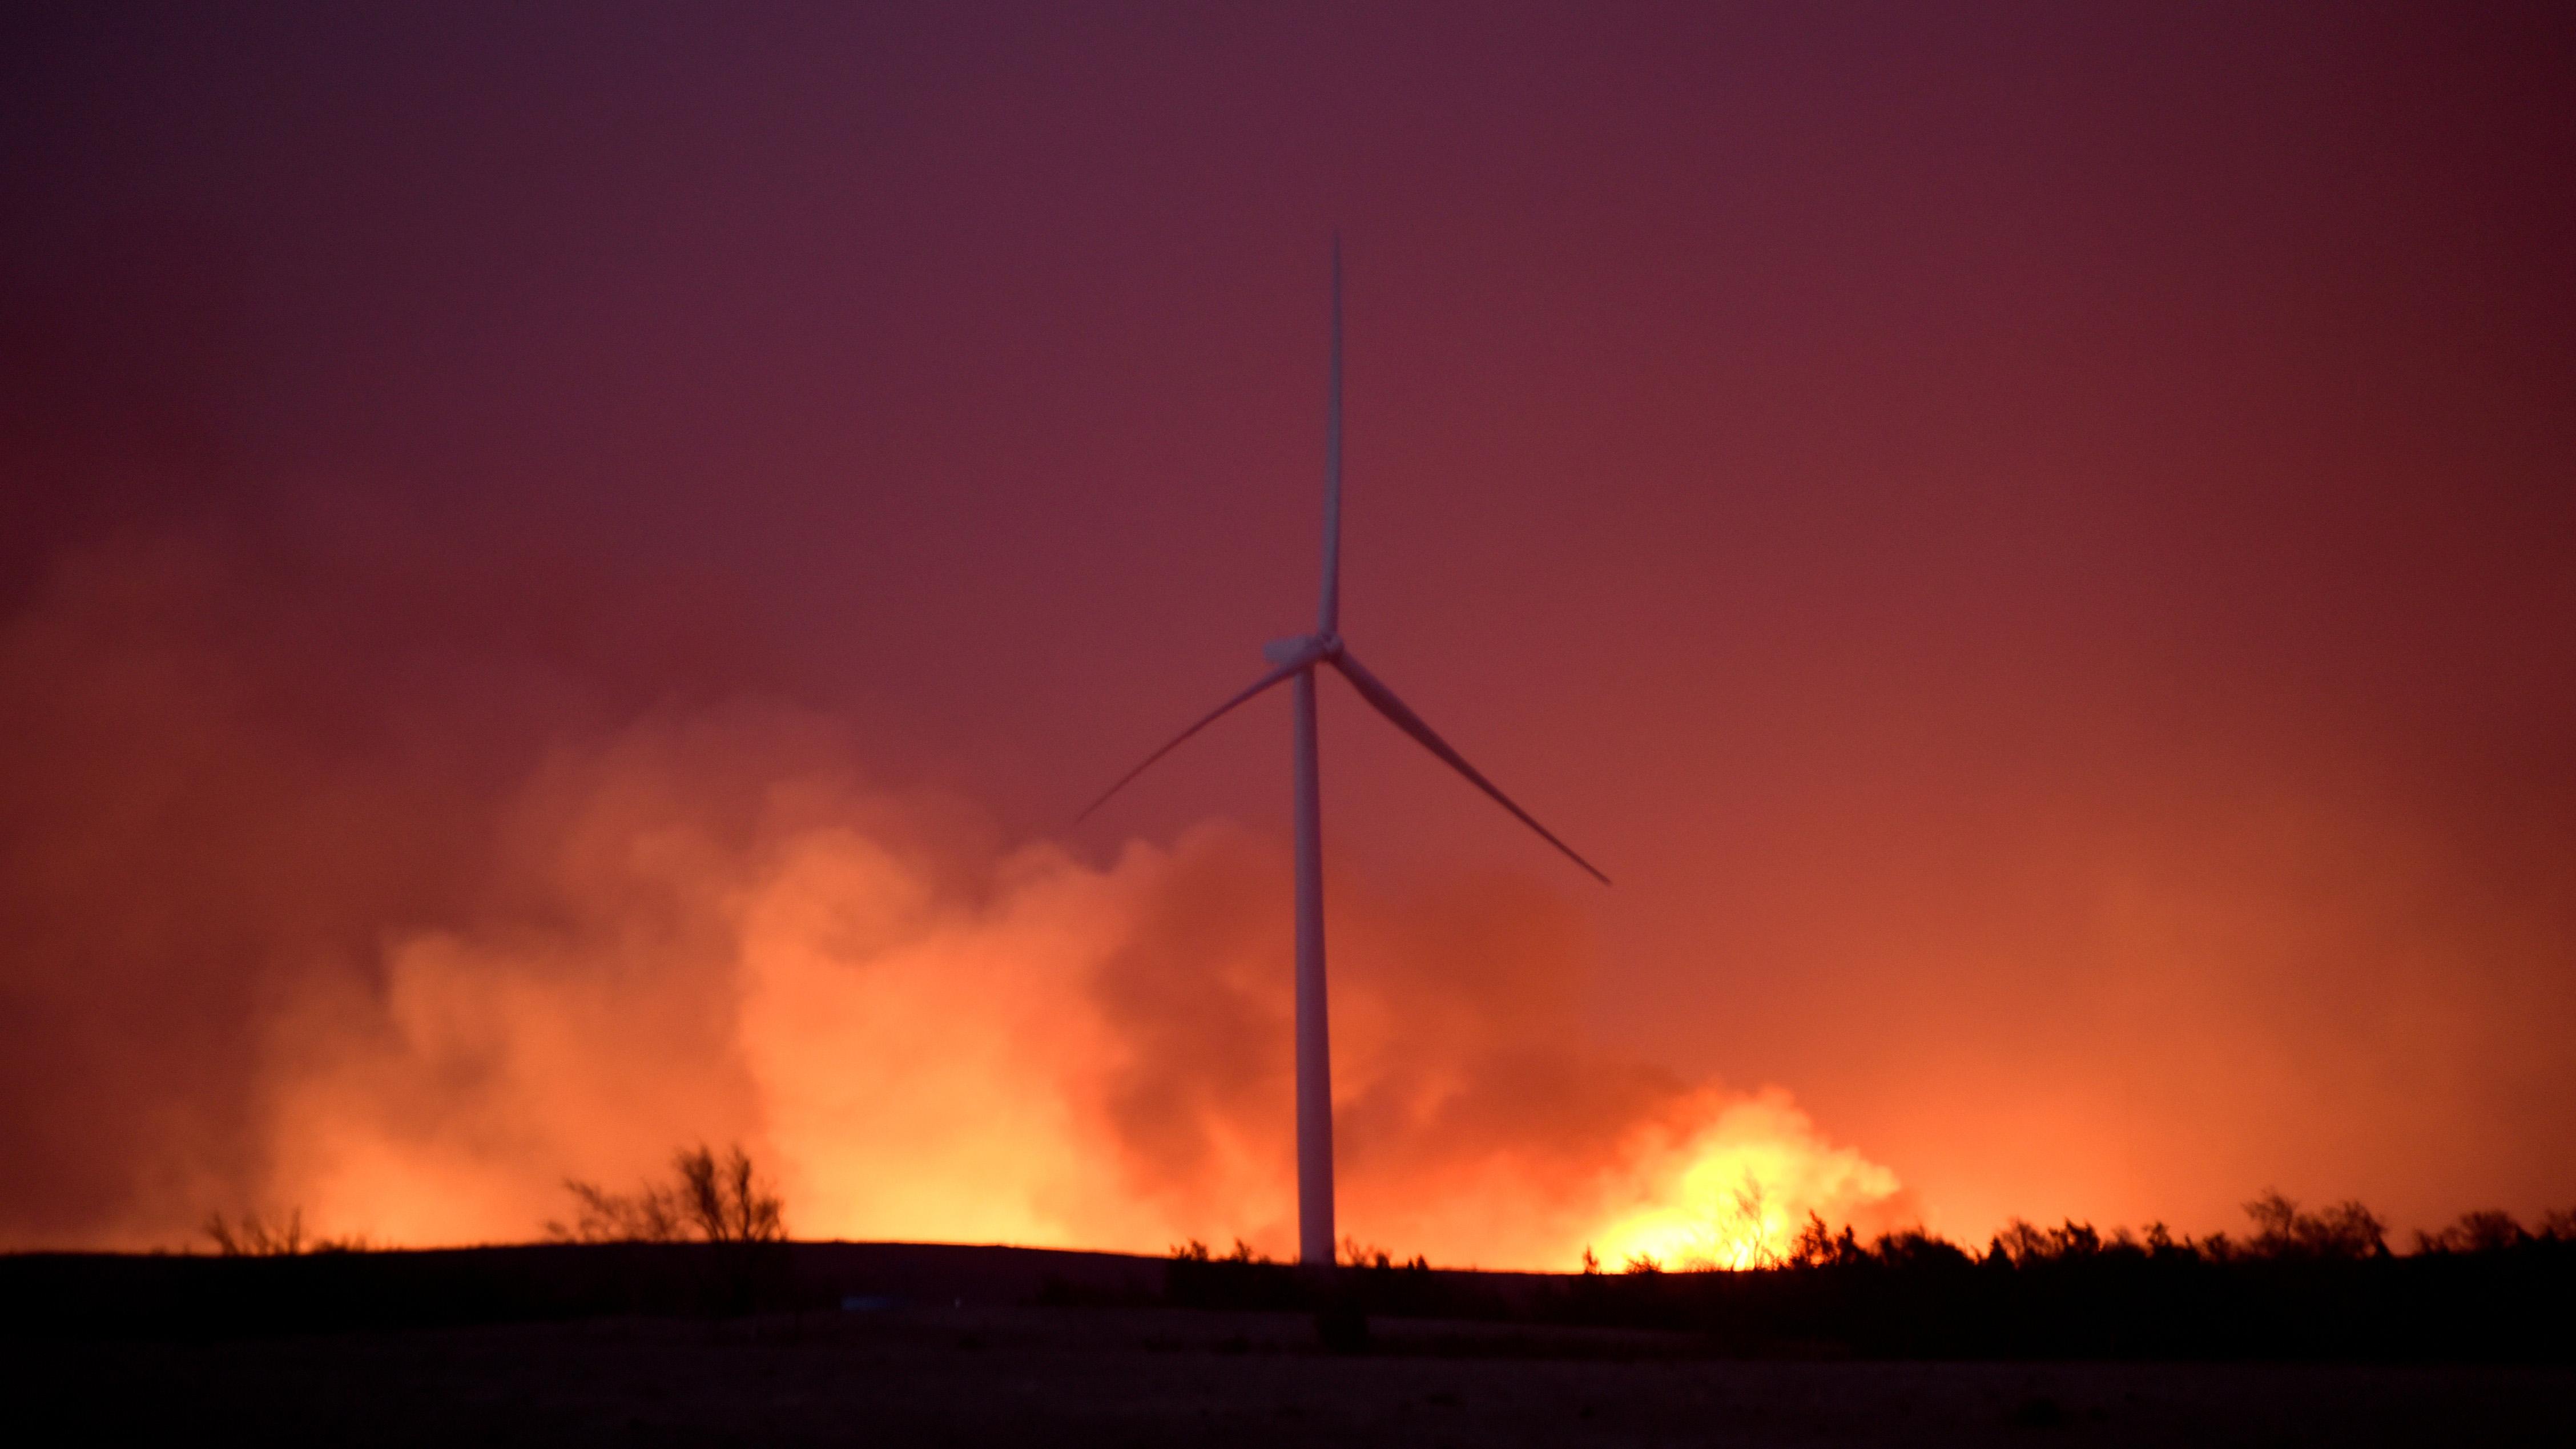 The Rhea fire rages behind a wind farm near Seiling, Oklahoma, U.S. April 17, 2018. REUTERS/Nick Oxford - RC19E0F22FE0